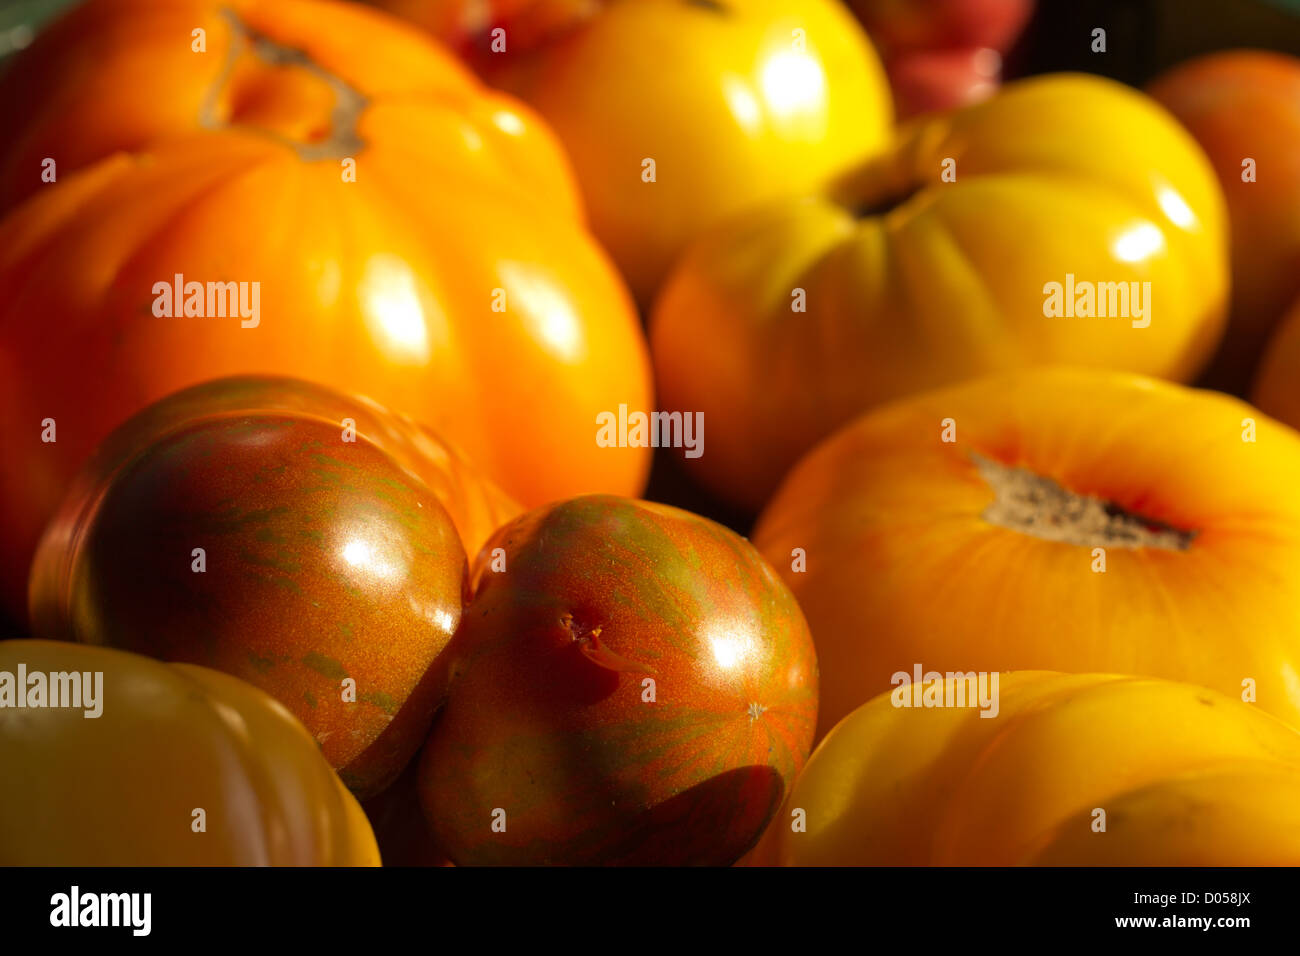 ripe heirloom tomatoes - Stock Image